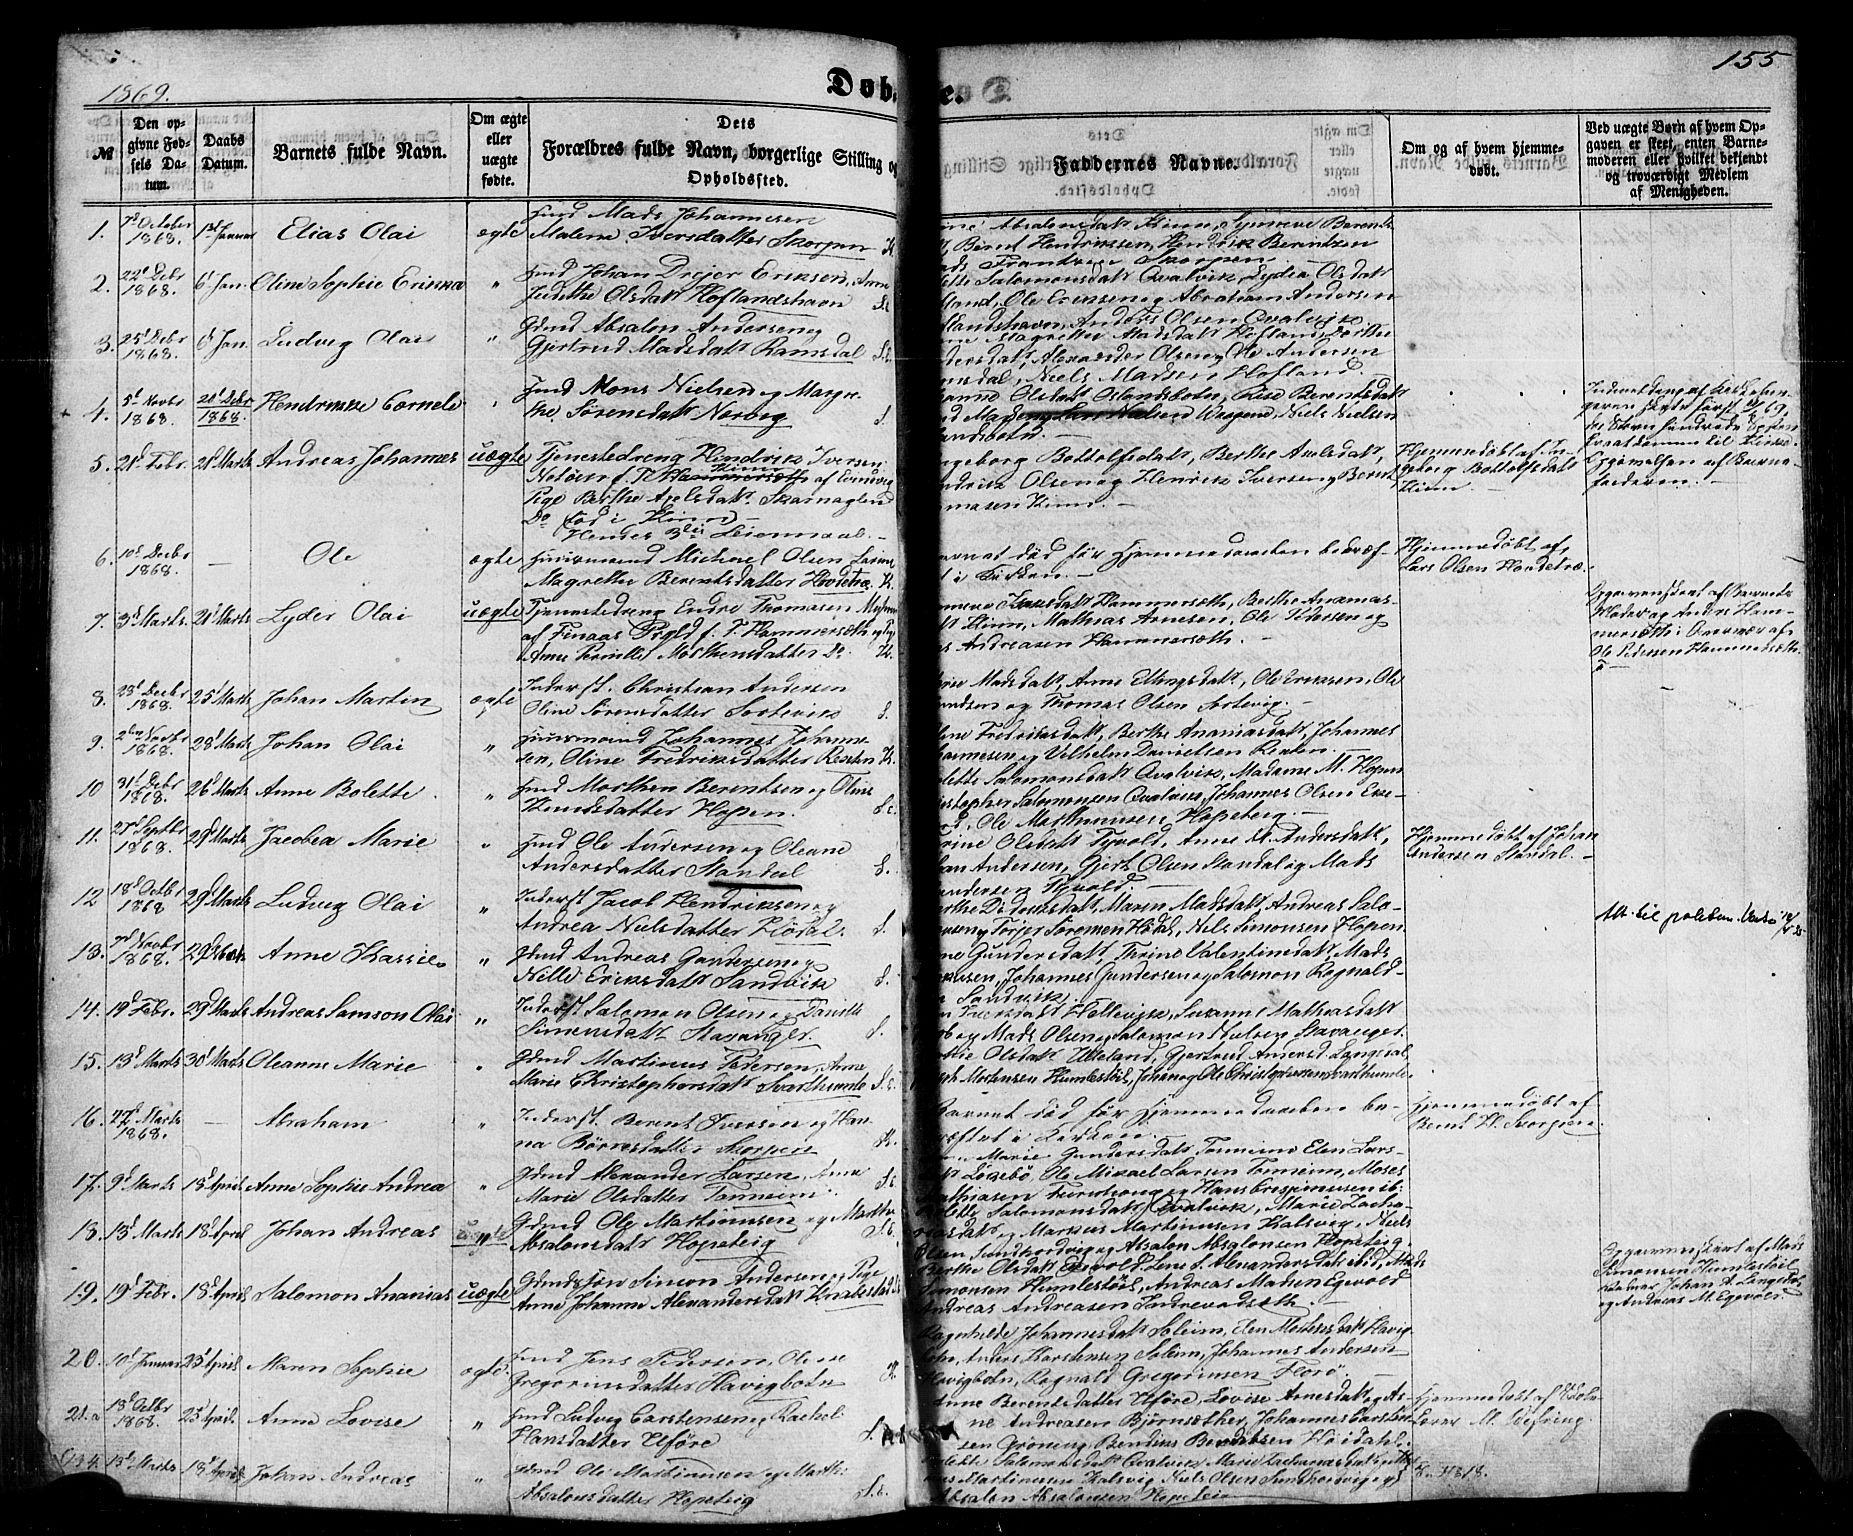 SAB, Kinn sokneprestembete, H/Haa/Haaa/L0006: Parish register (official) no. A 6, 1857-1885, p. 155